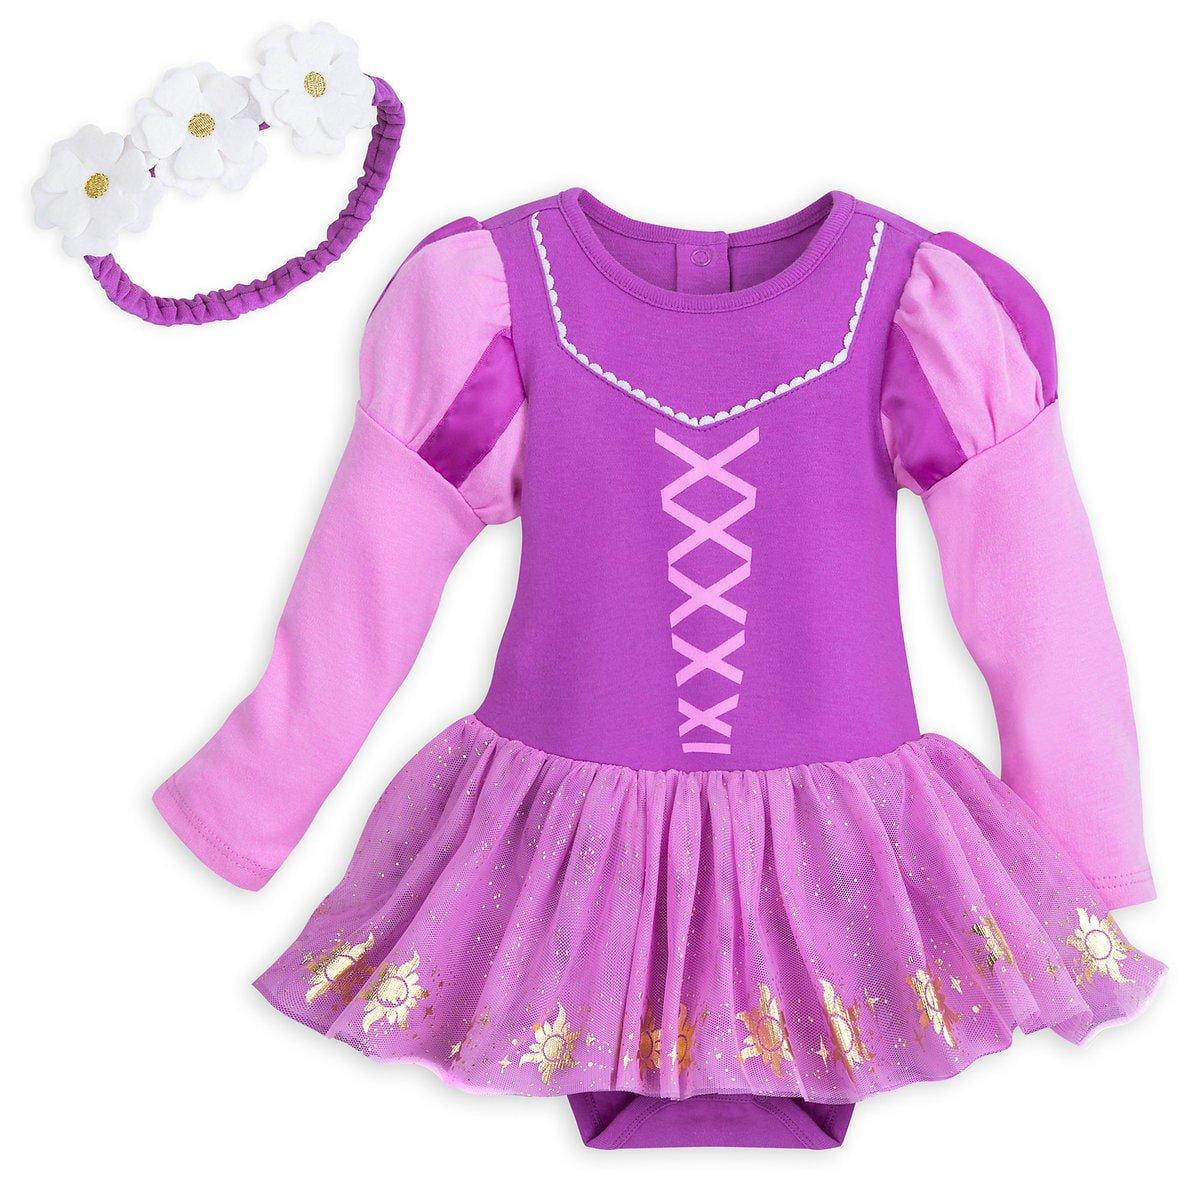 Disney Store Rapunzel Baby Costume 9-12 Months 2018 New